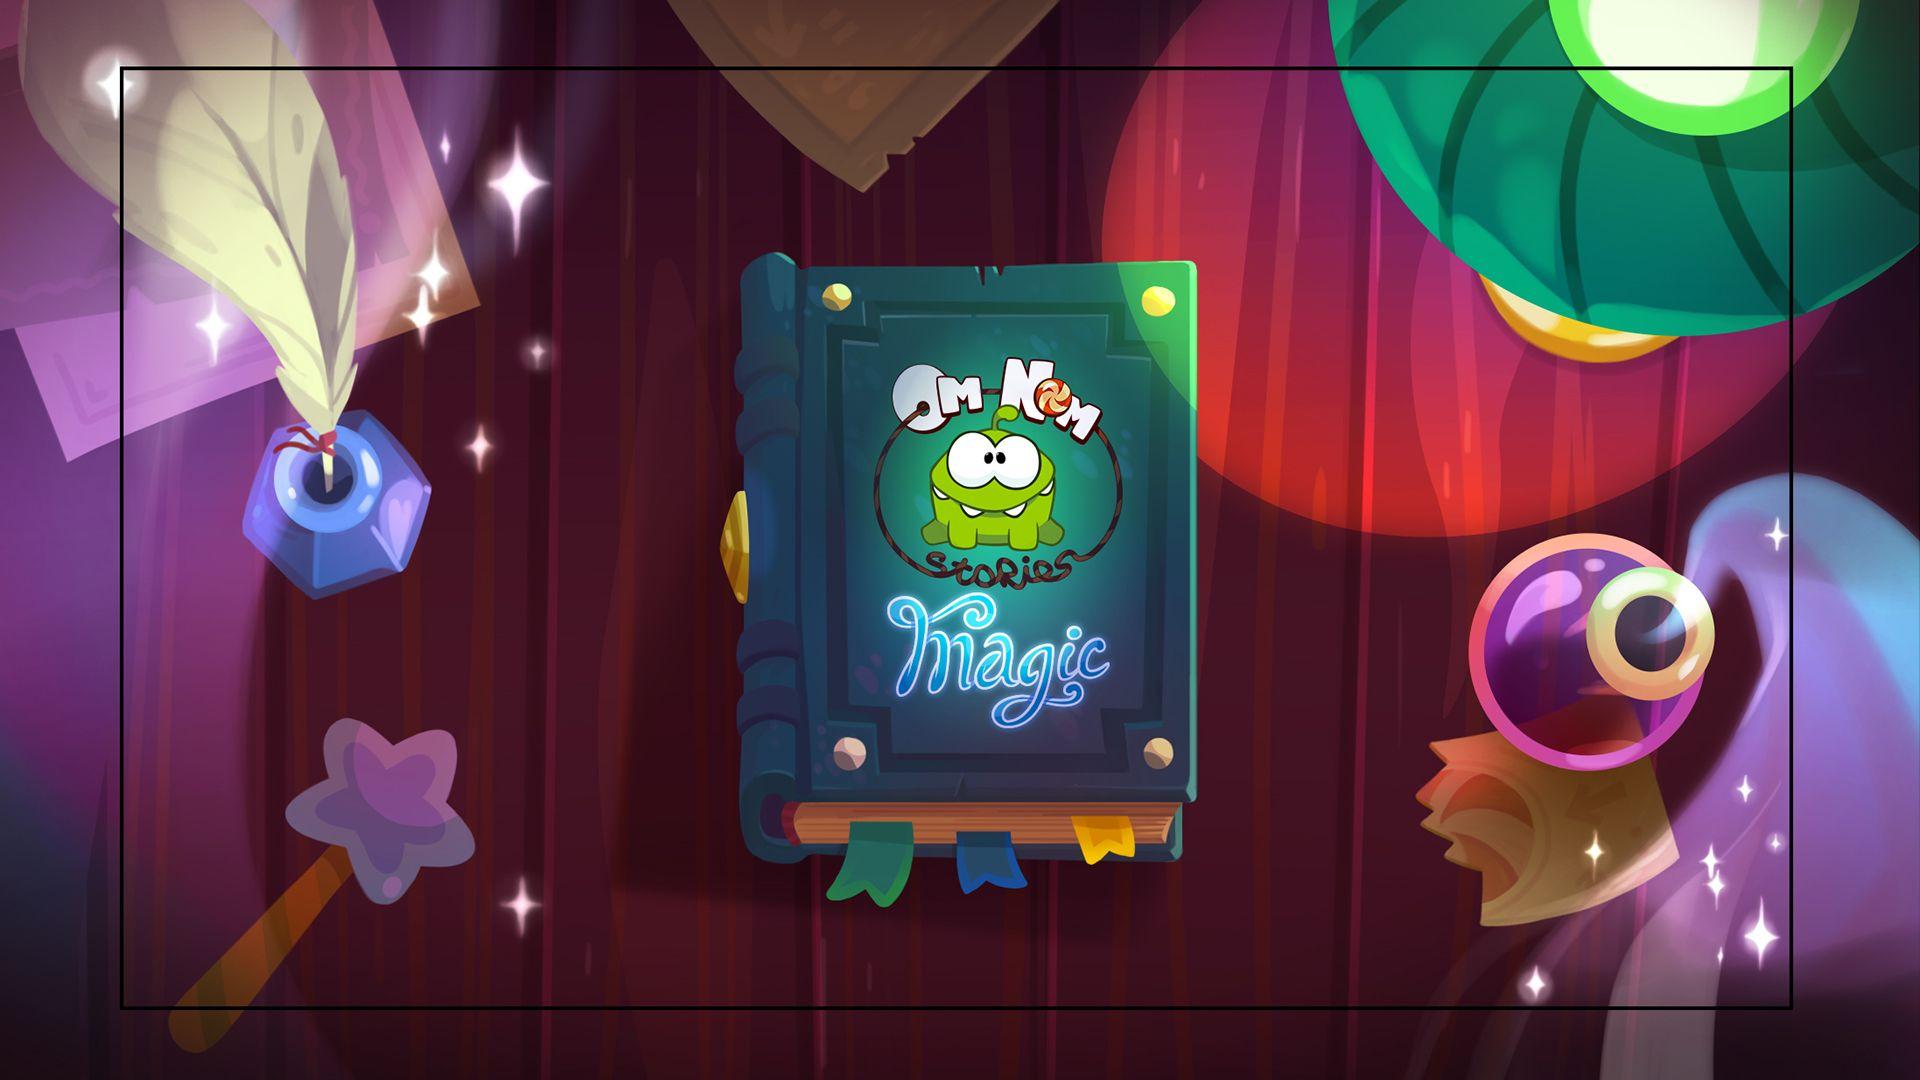 Backgrounds for Om Nom Stories: Magic. on Behance